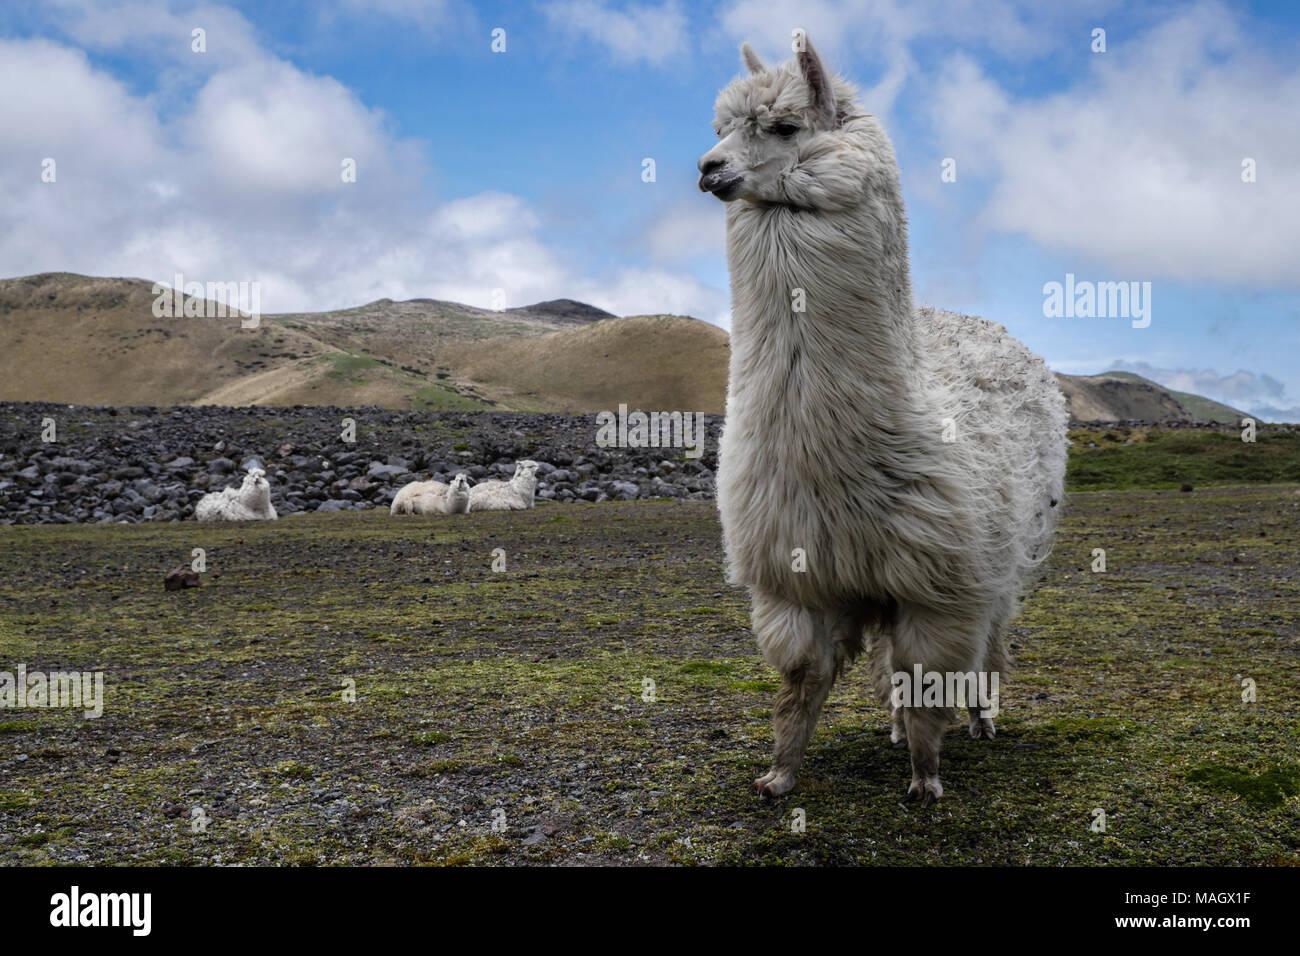 Llamas on Antisana Mountain - Stock Image